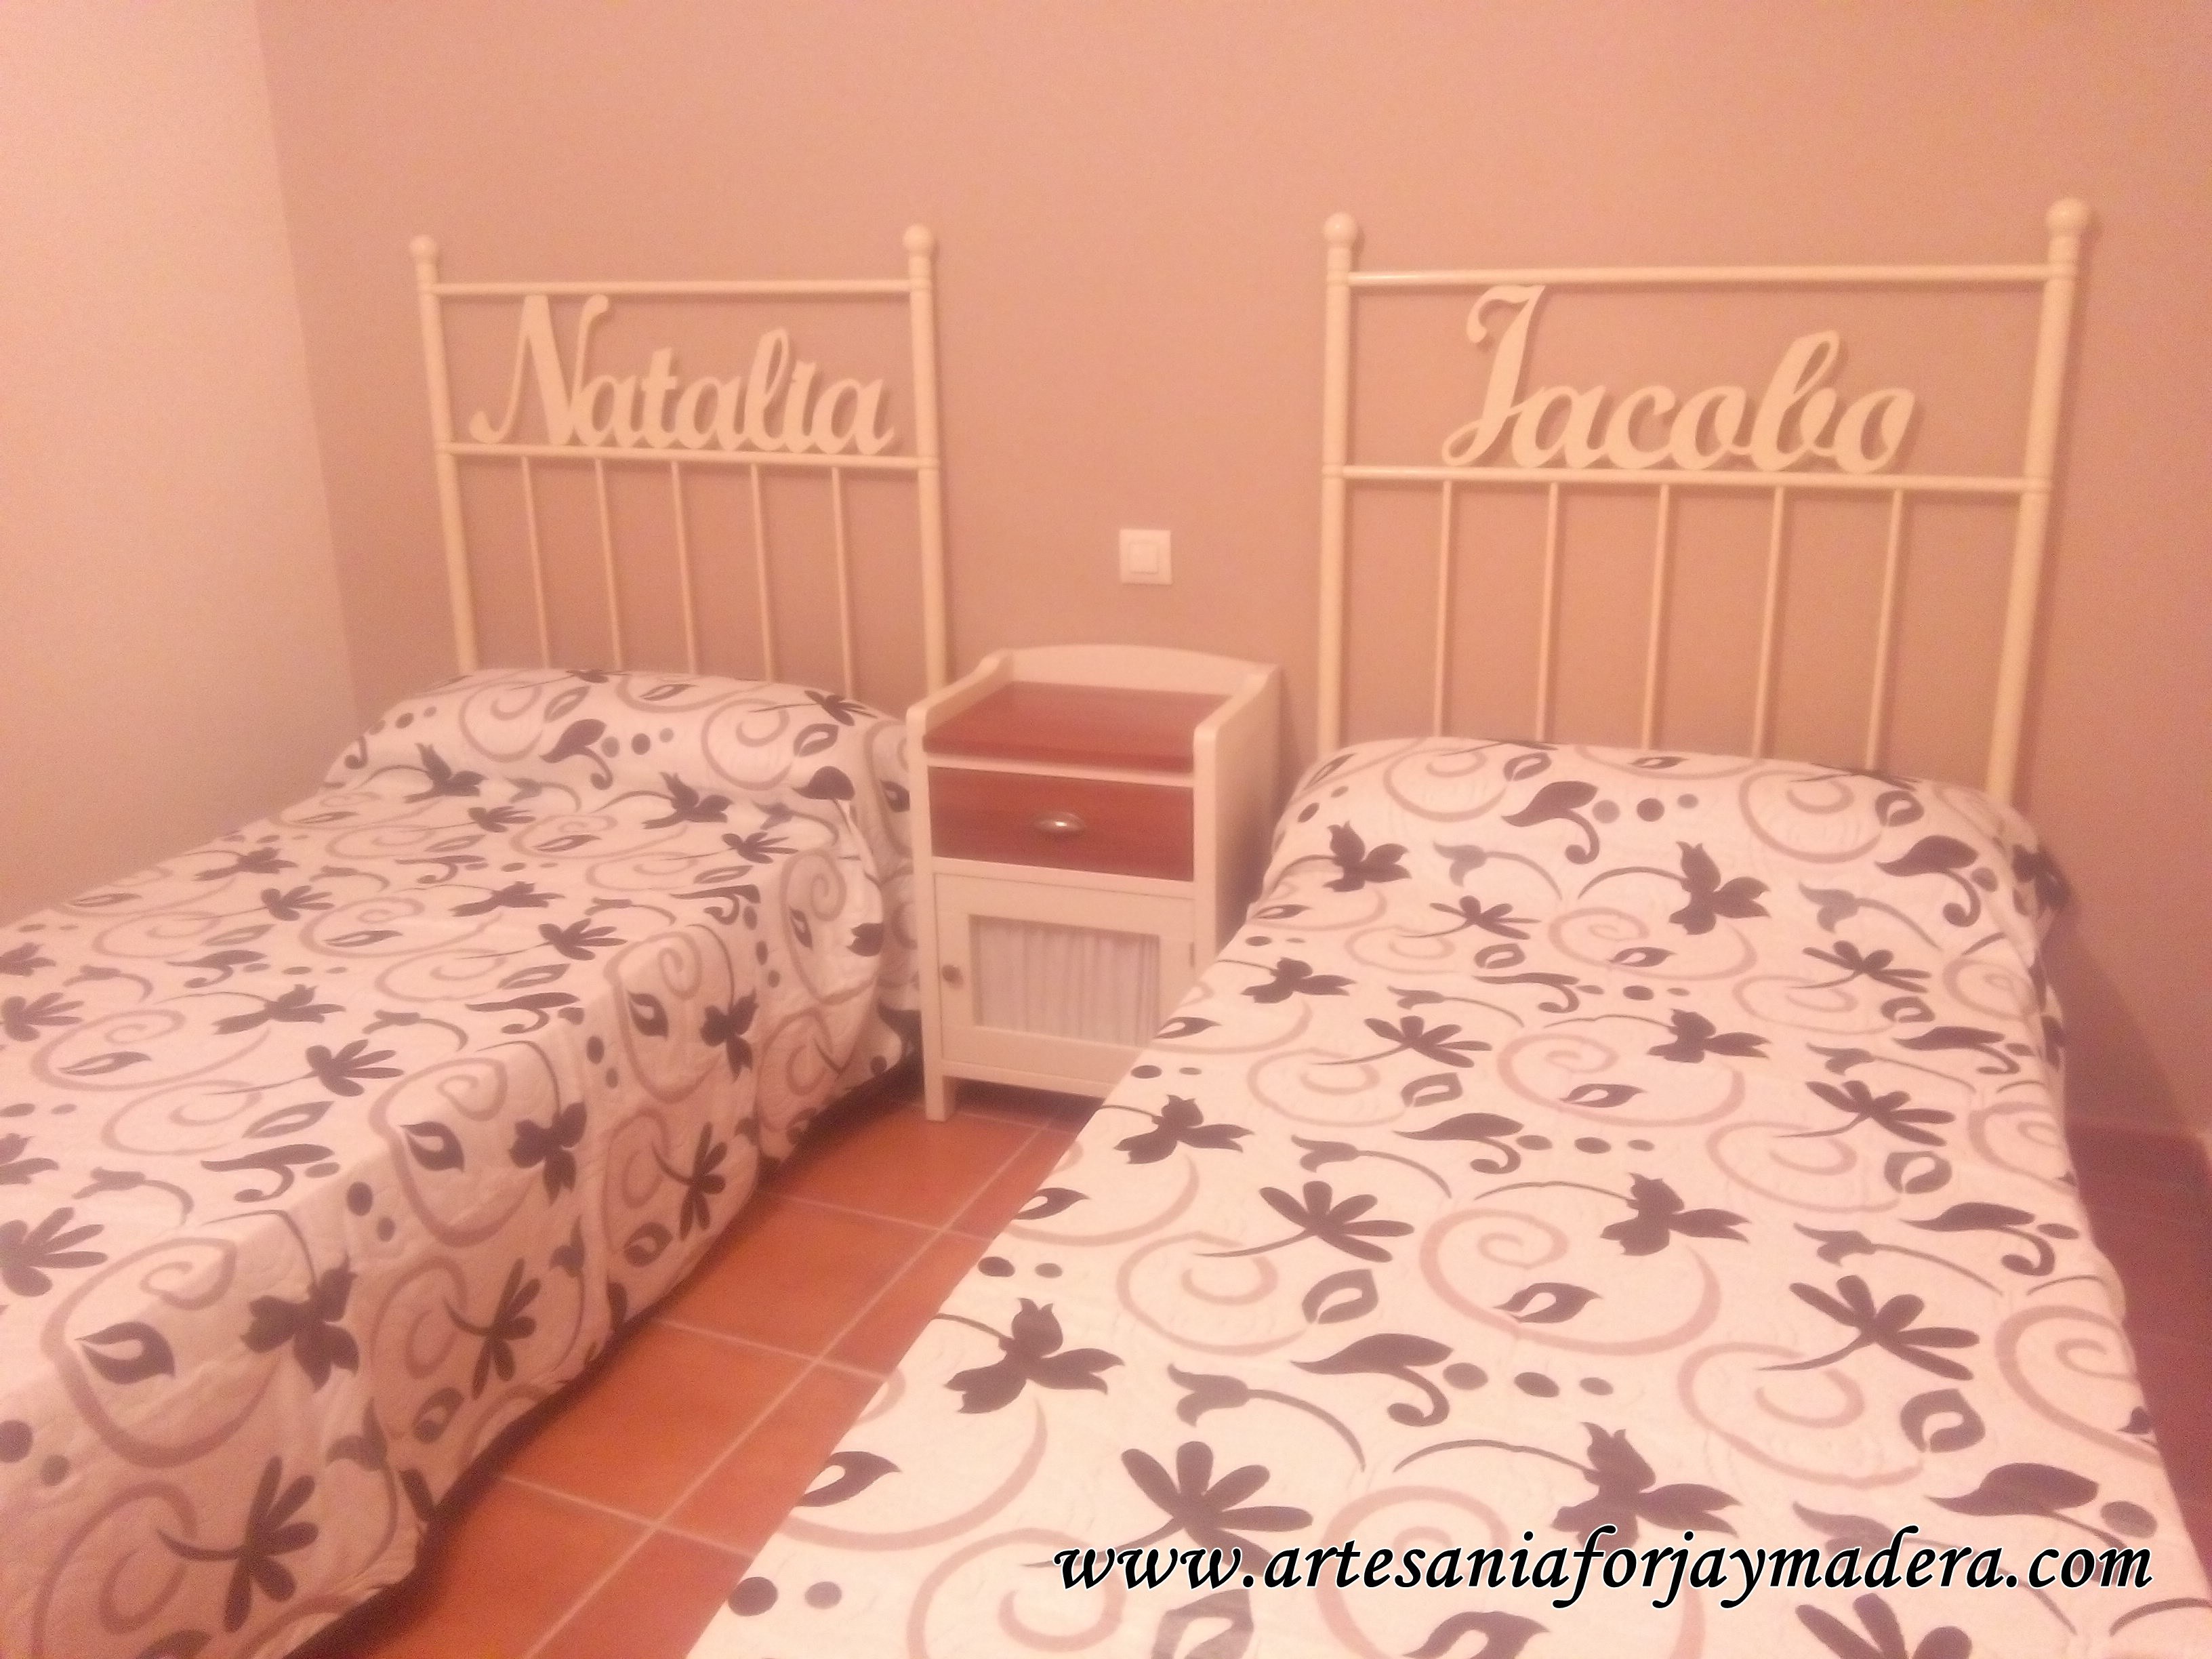 Cabezales infantiles cabezales infantiles para inspirarte - Cabezal cama infantil ...